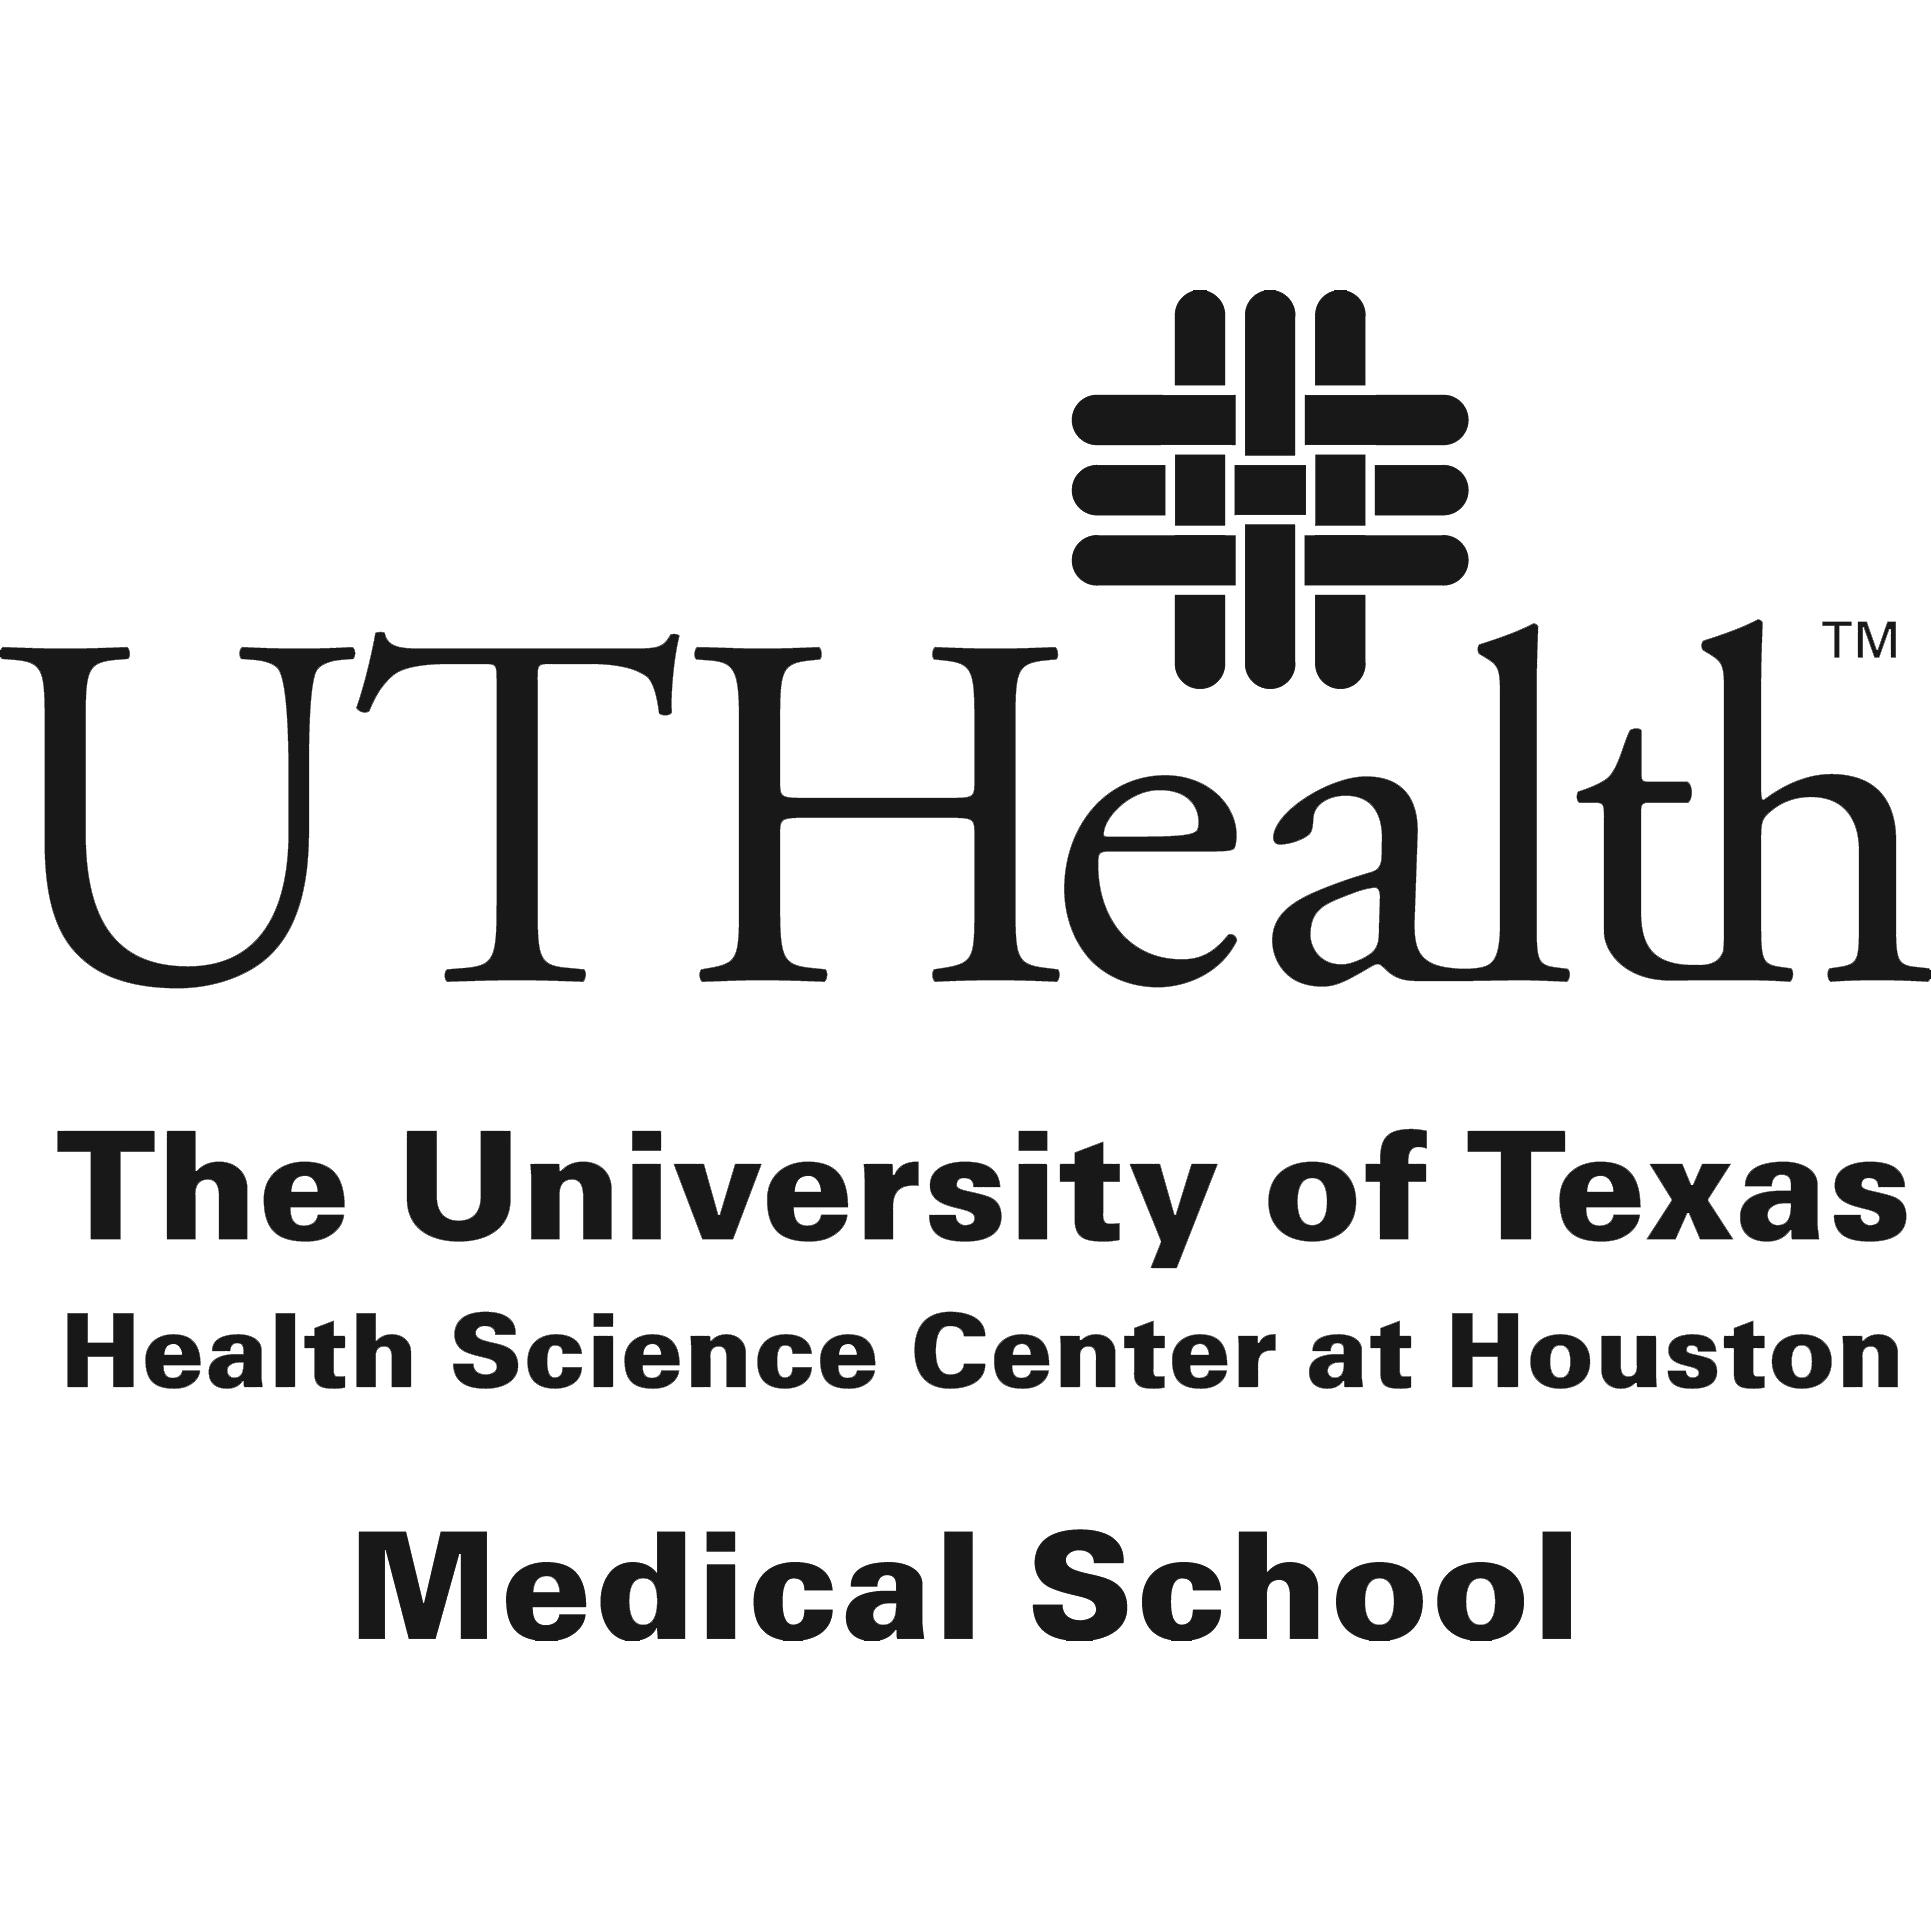 University of Texas Health Sciences Center Logo